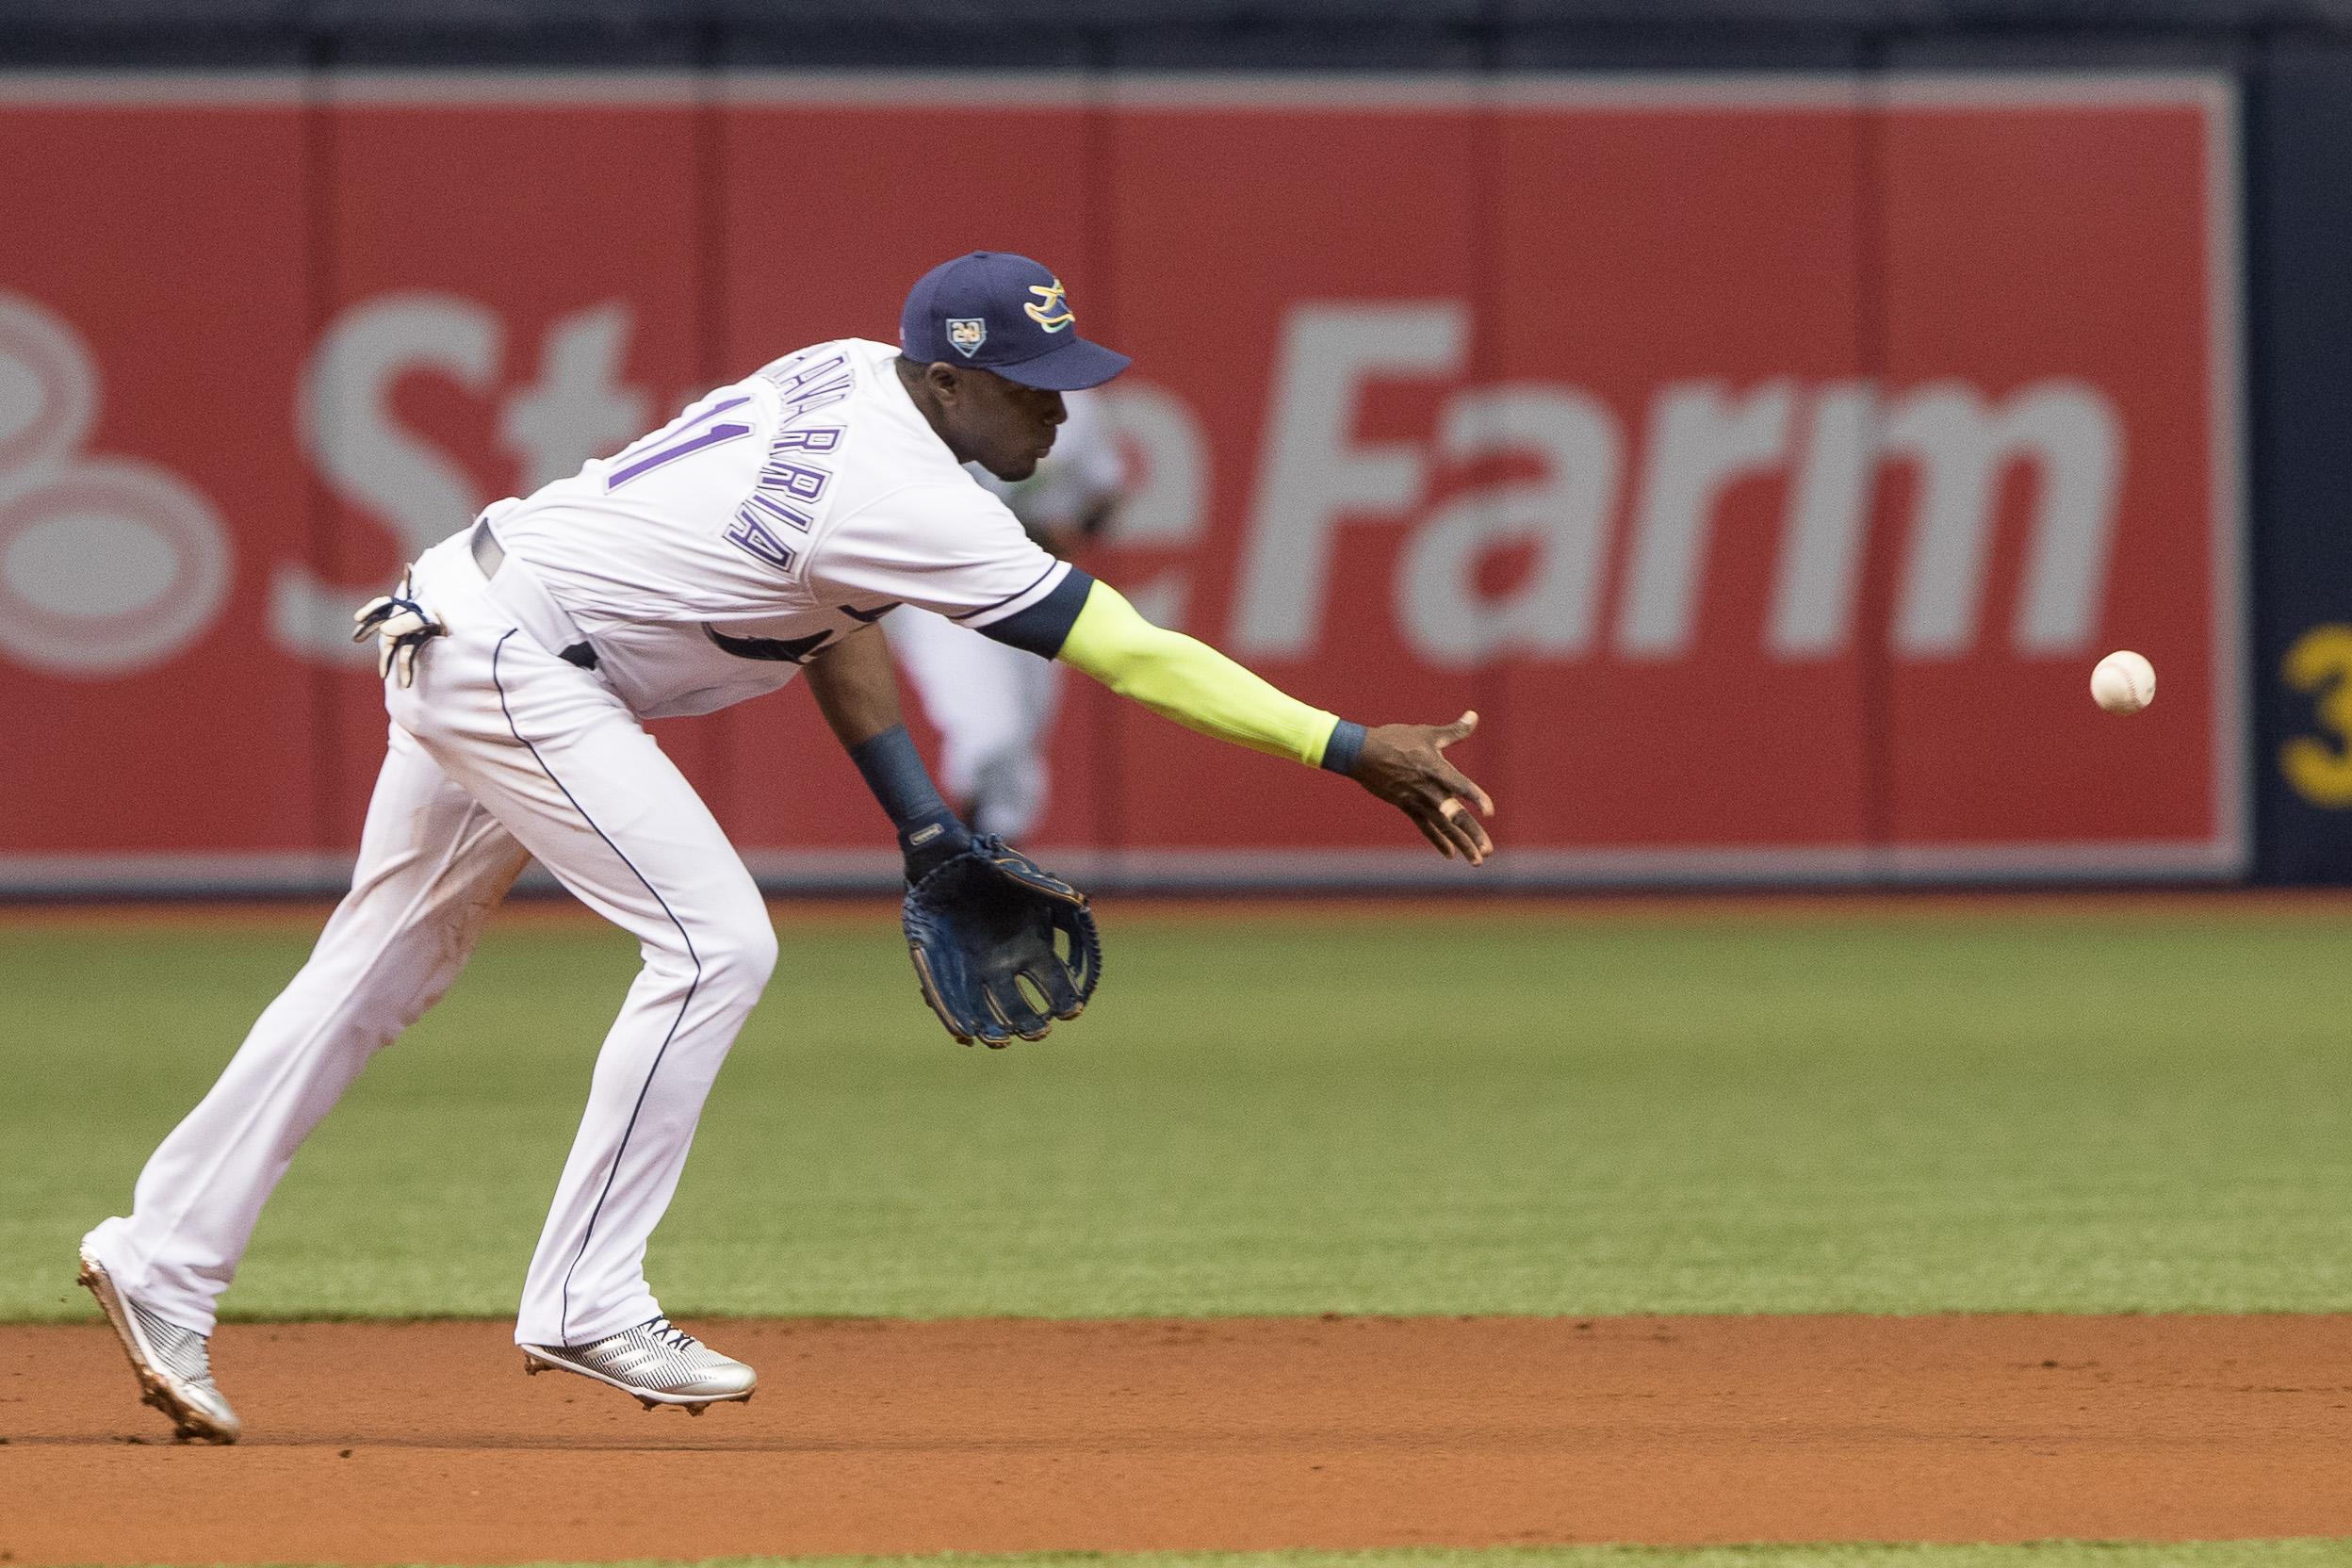 Adeiny Hechavarria tosses the ball to second base./STEVEN MUNCIE